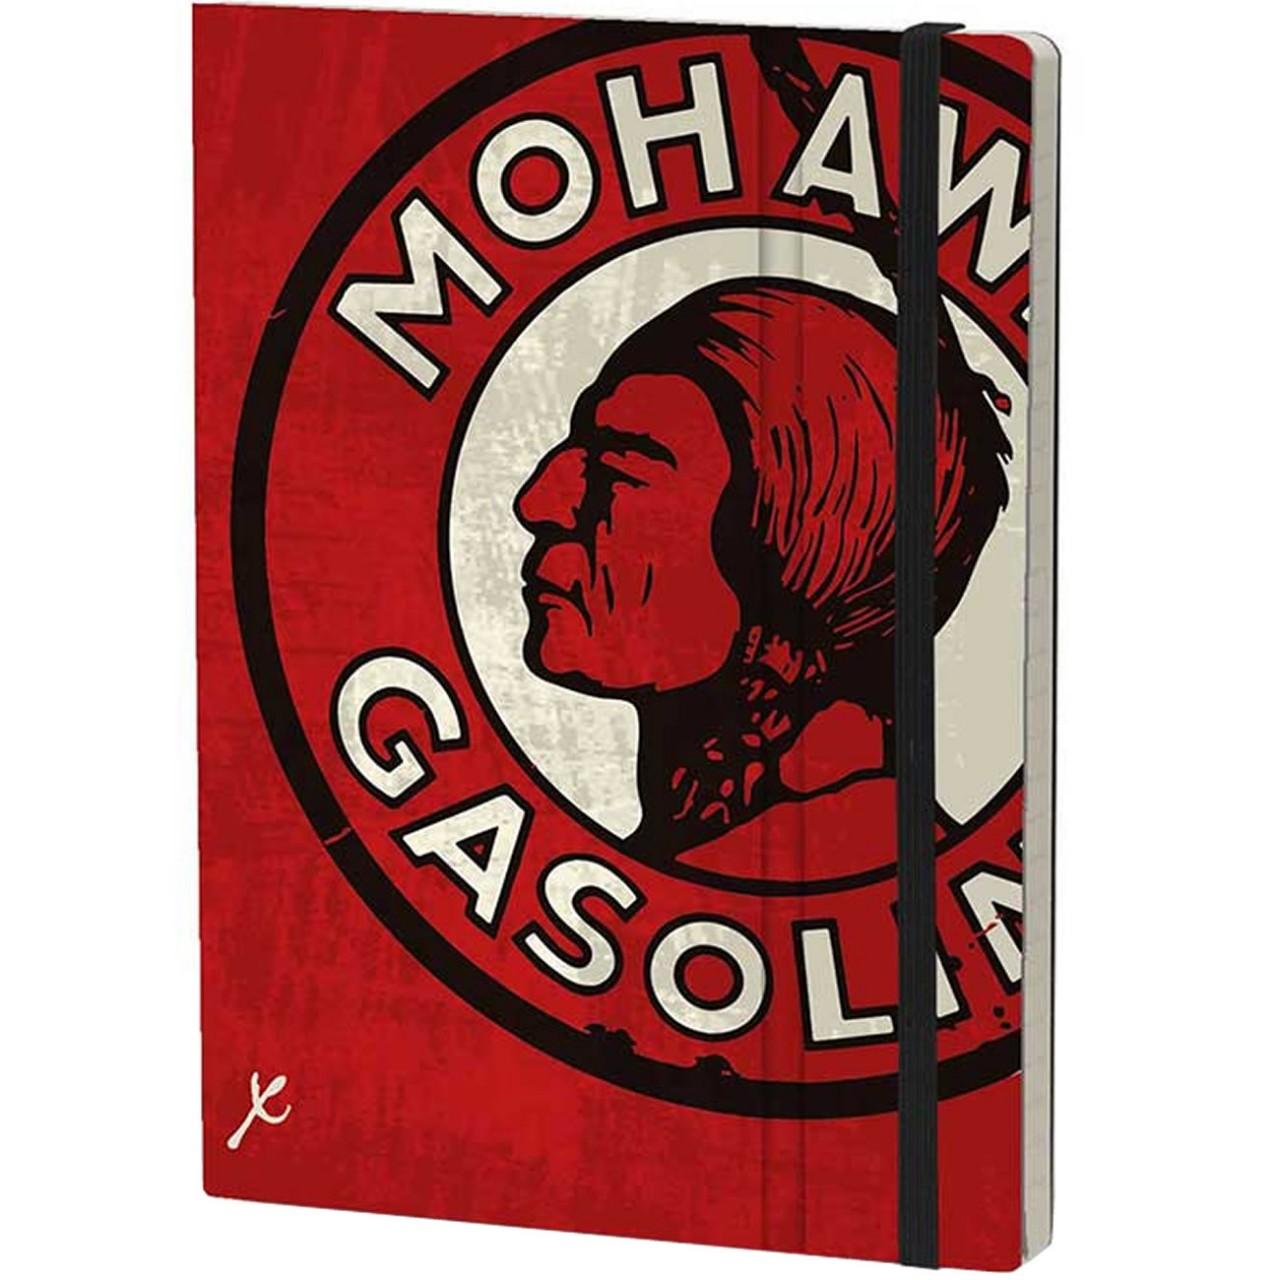 Stifflexible Notizbuch GASOLINE 15 x 21 cm 192 S., MOHAWK